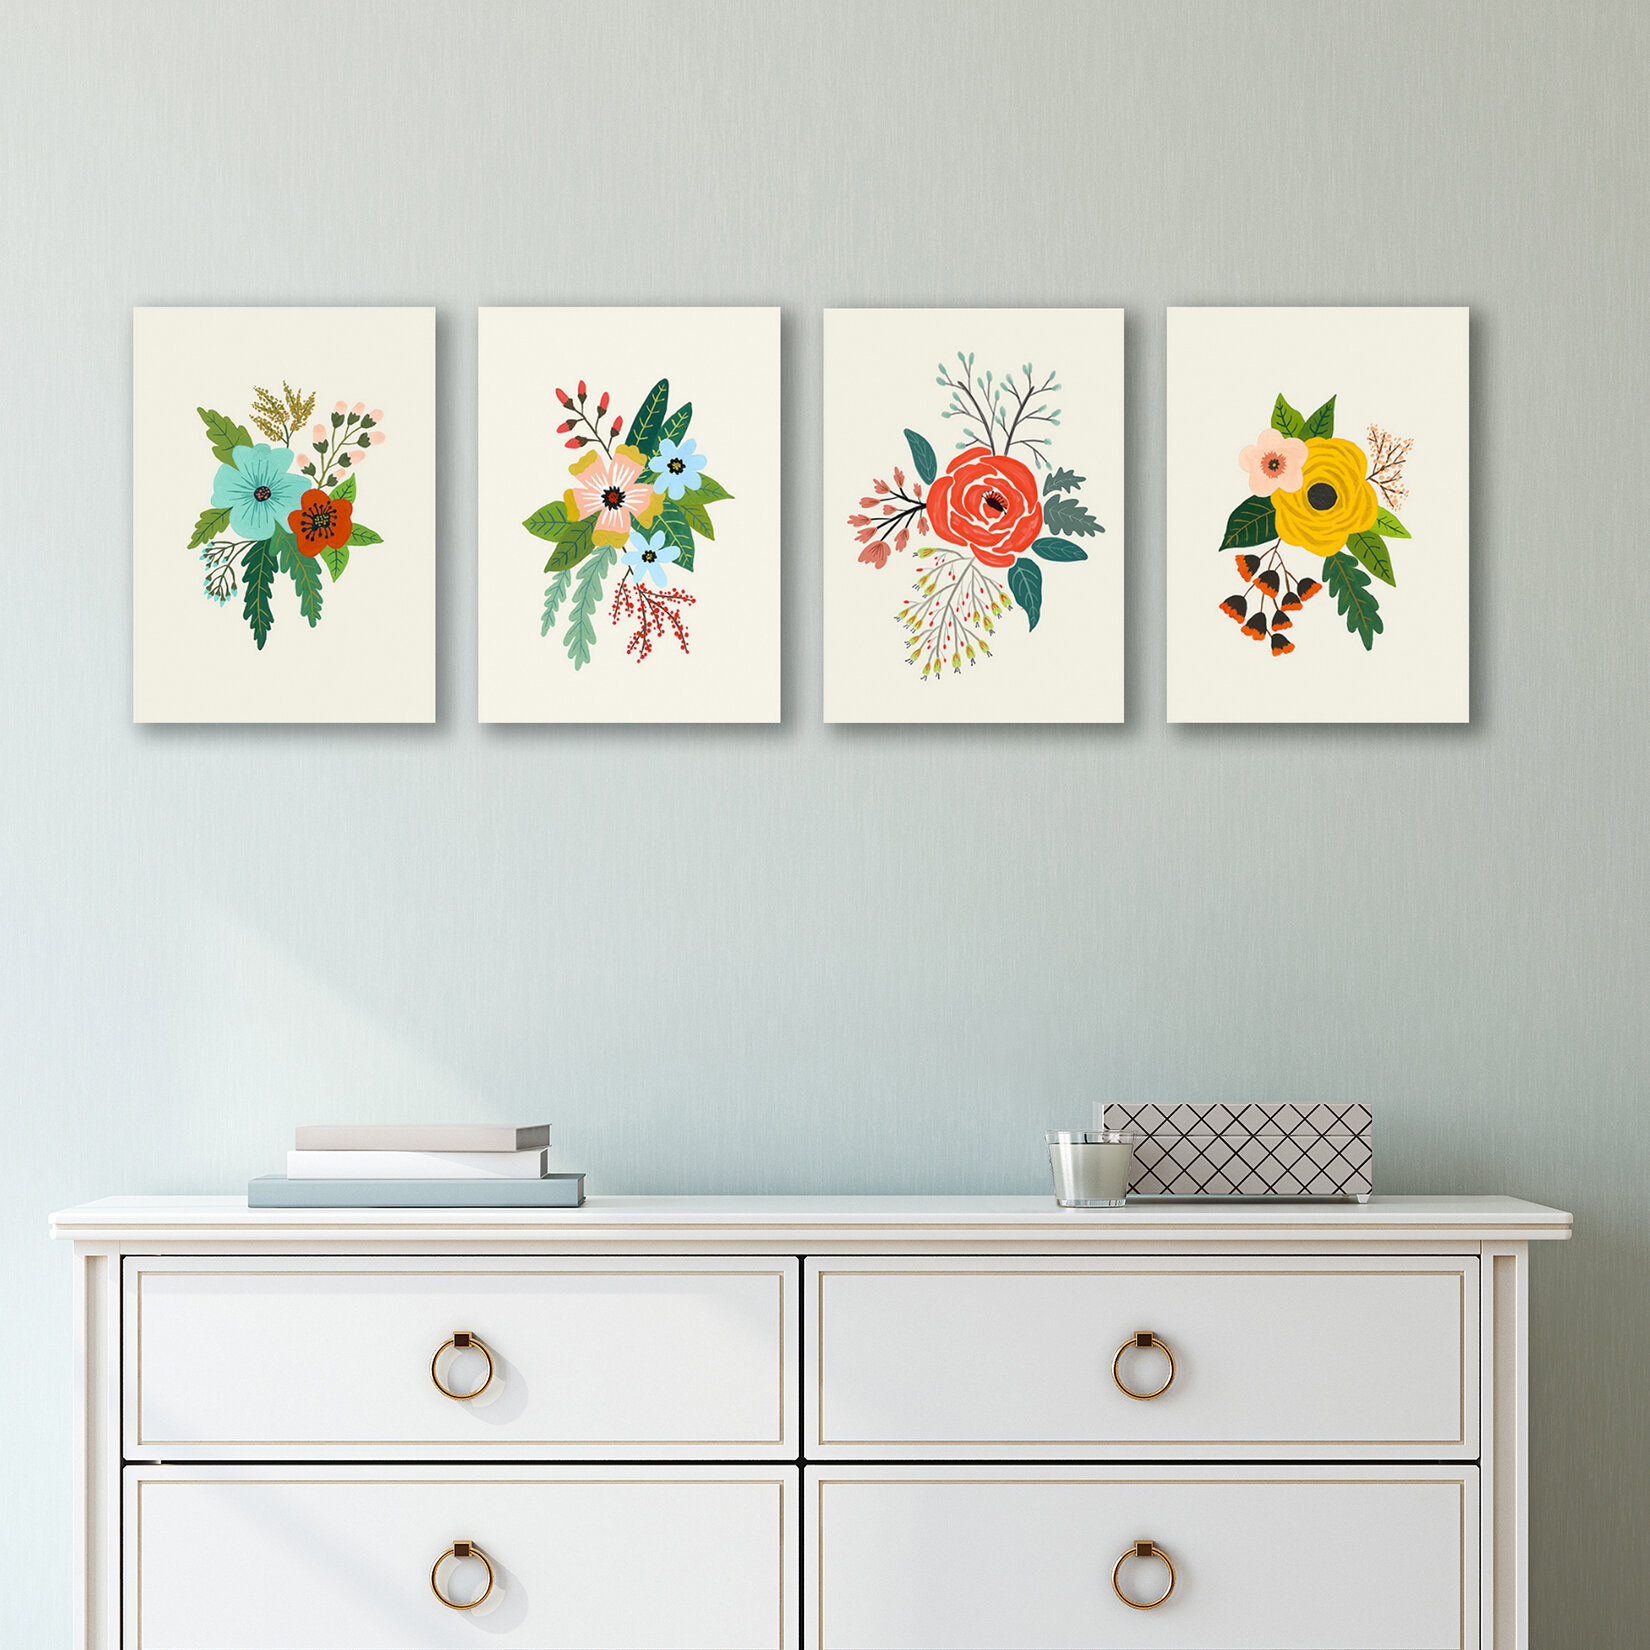 'Folk Art Flowers' Gallery Wall Set on Canvas